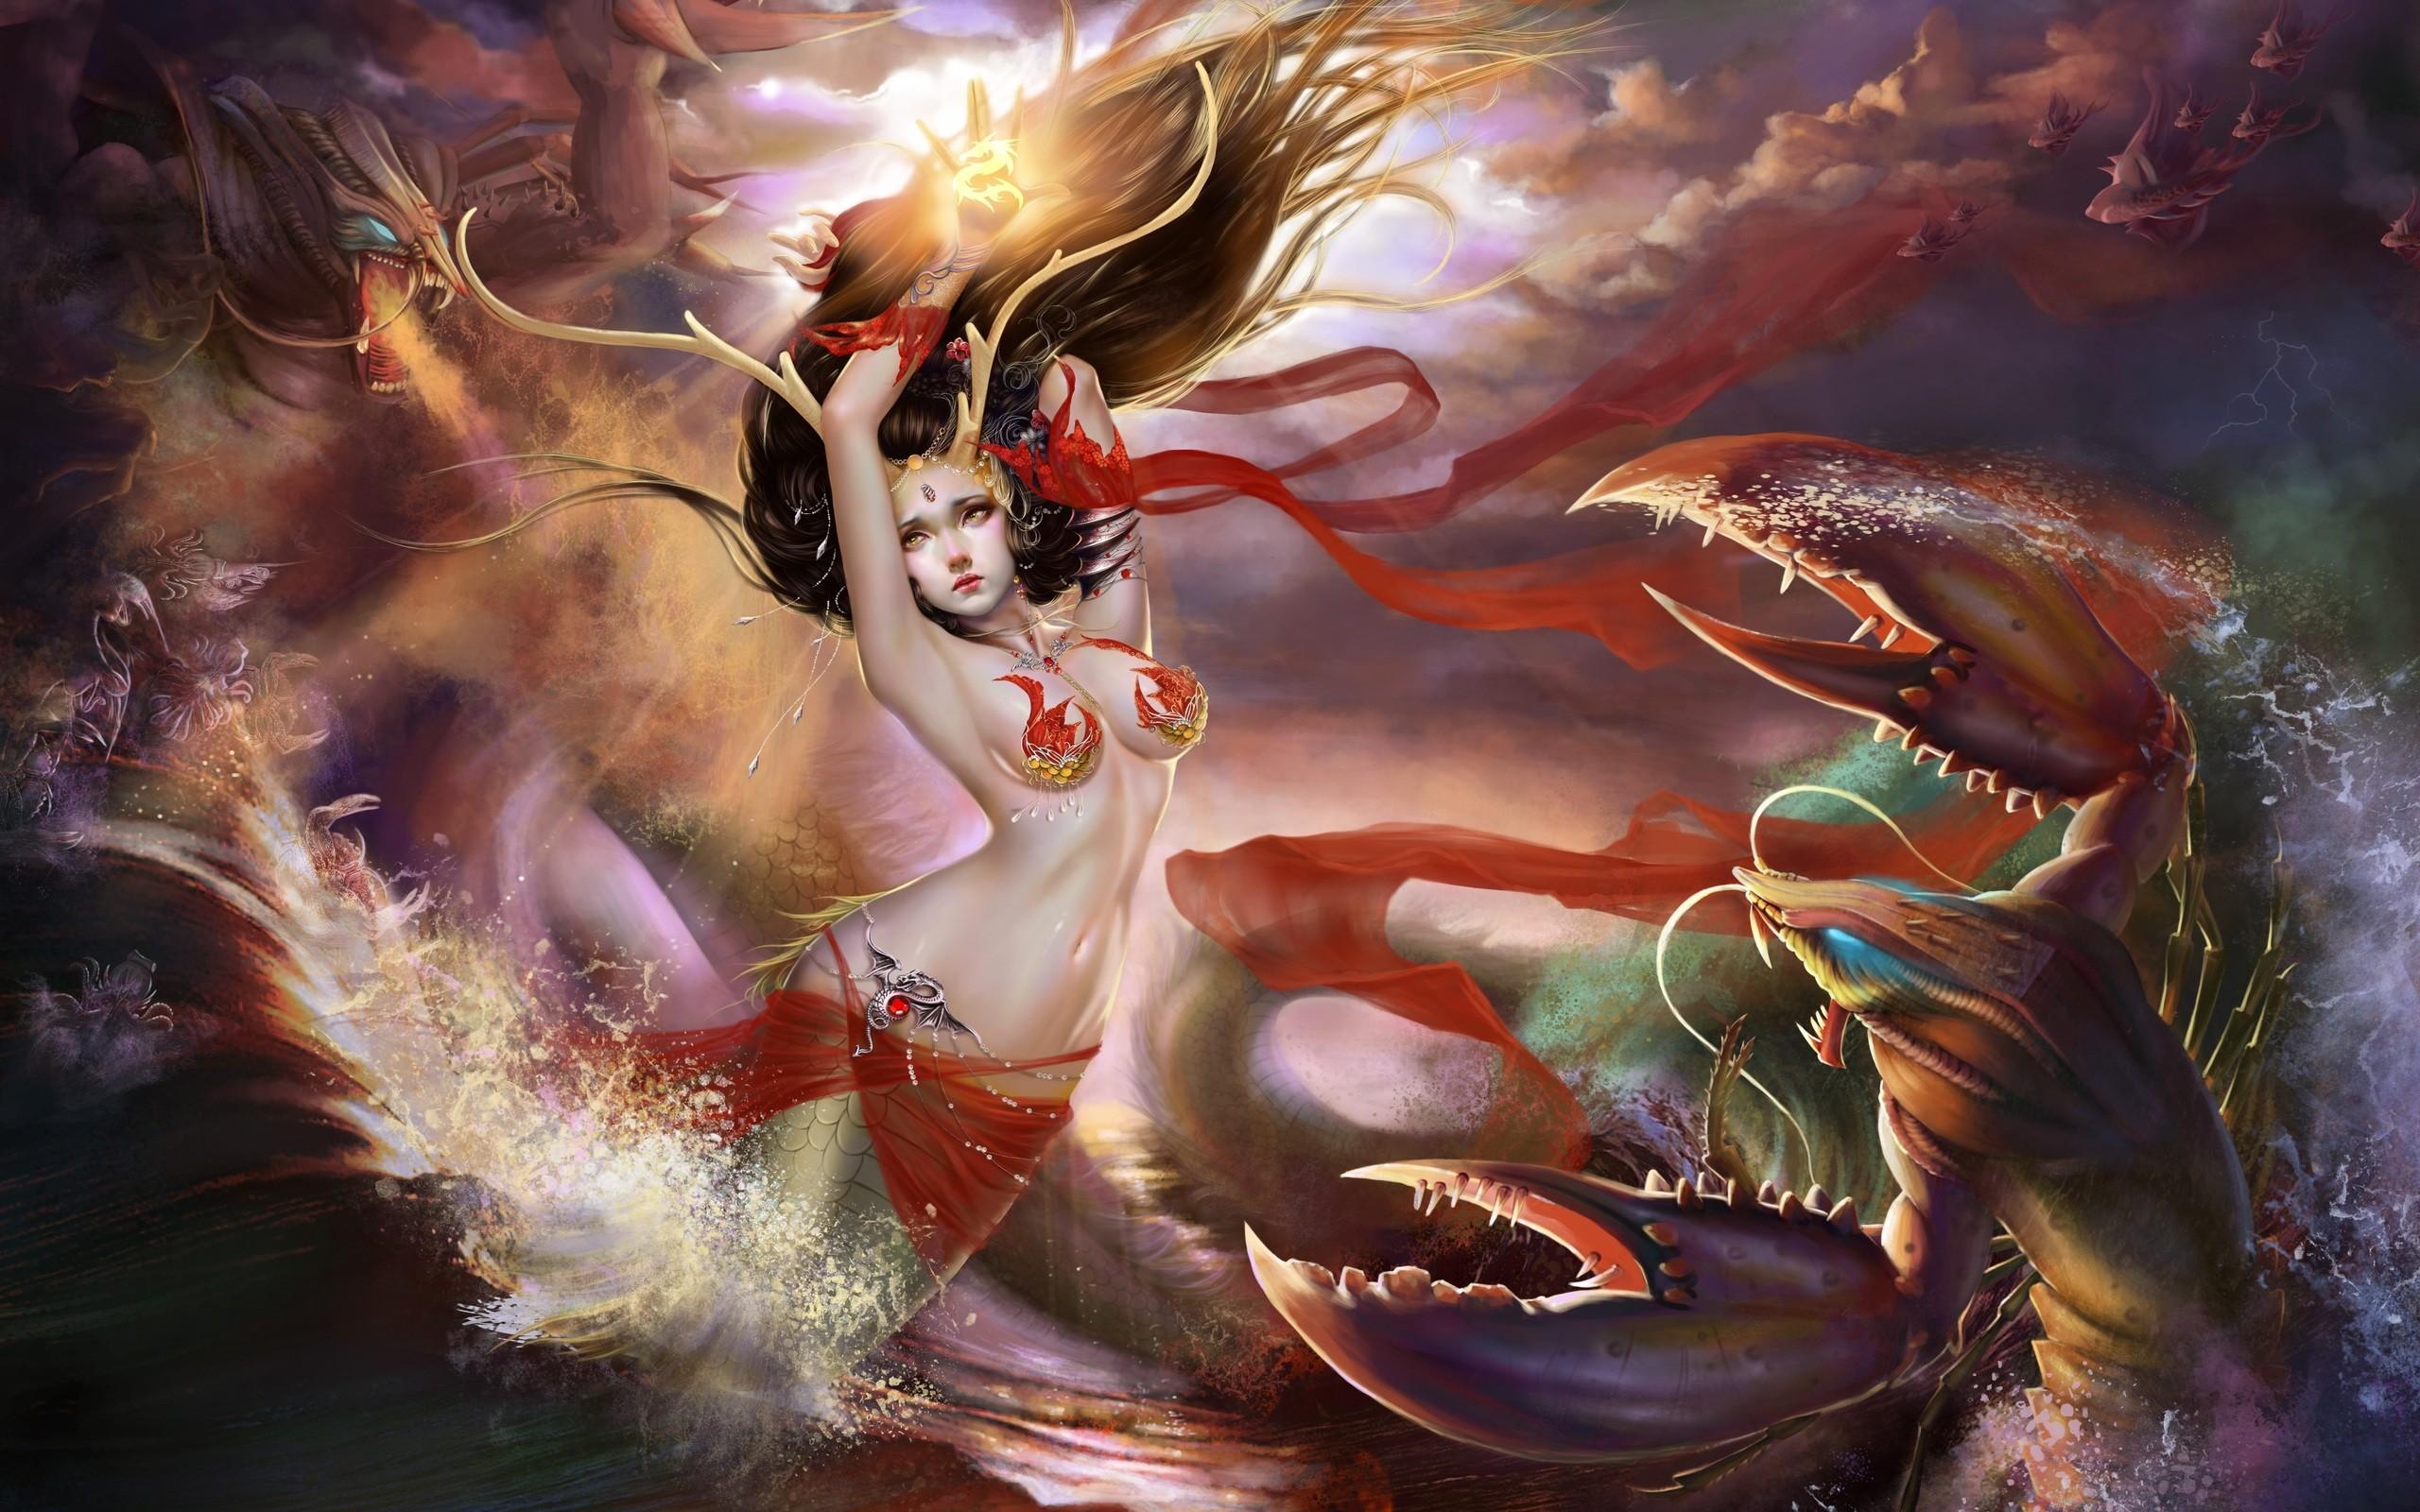 mermaids artwork   Mermaid Wallpaper – Wallpaper, High Definition, High  Quality .